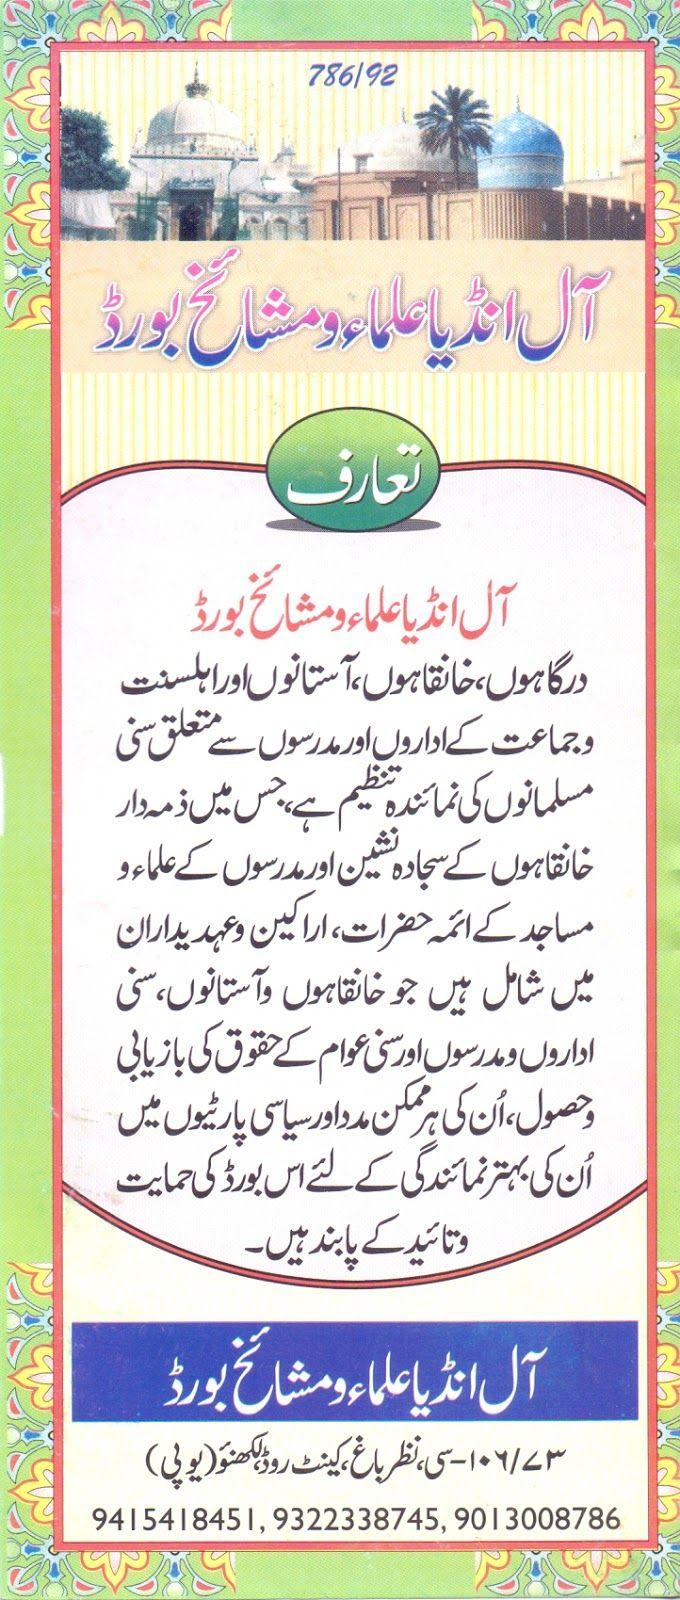 Aale Rasool Ahmad: All India Ulama & Mashaikh Board Kya hai ?